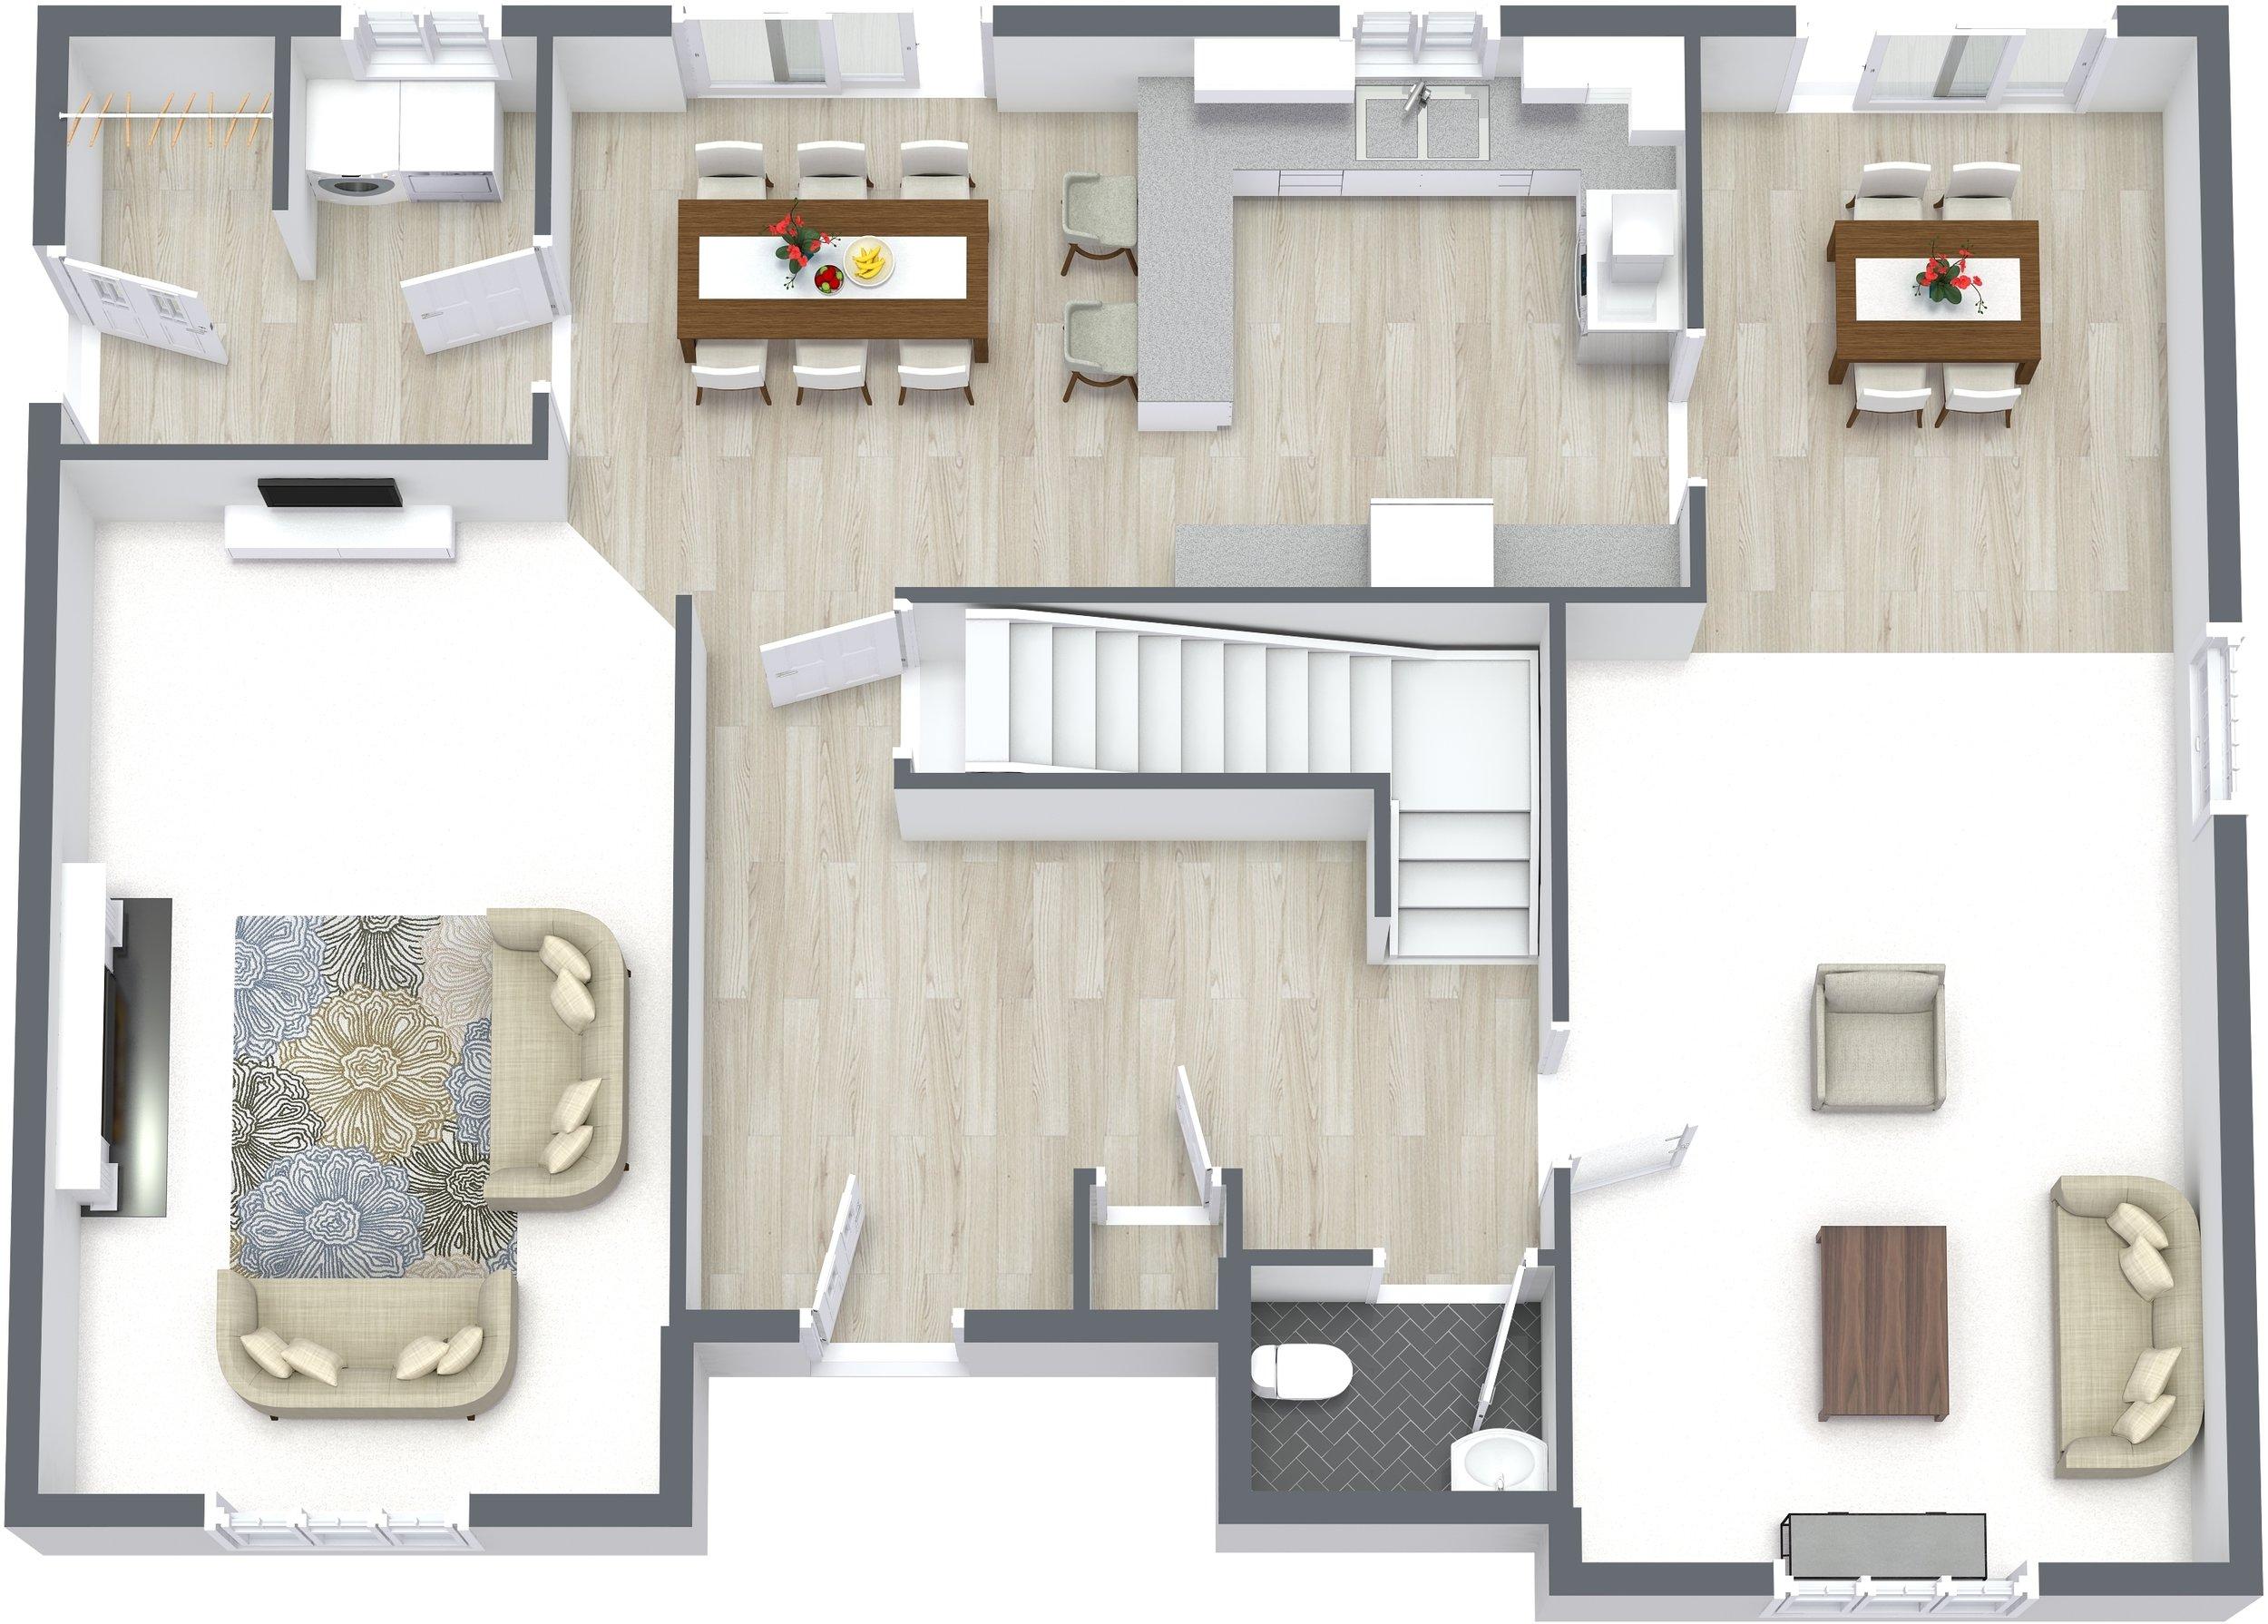 3080 South Street - 1. Floor - 3D Floor Plan.jpg